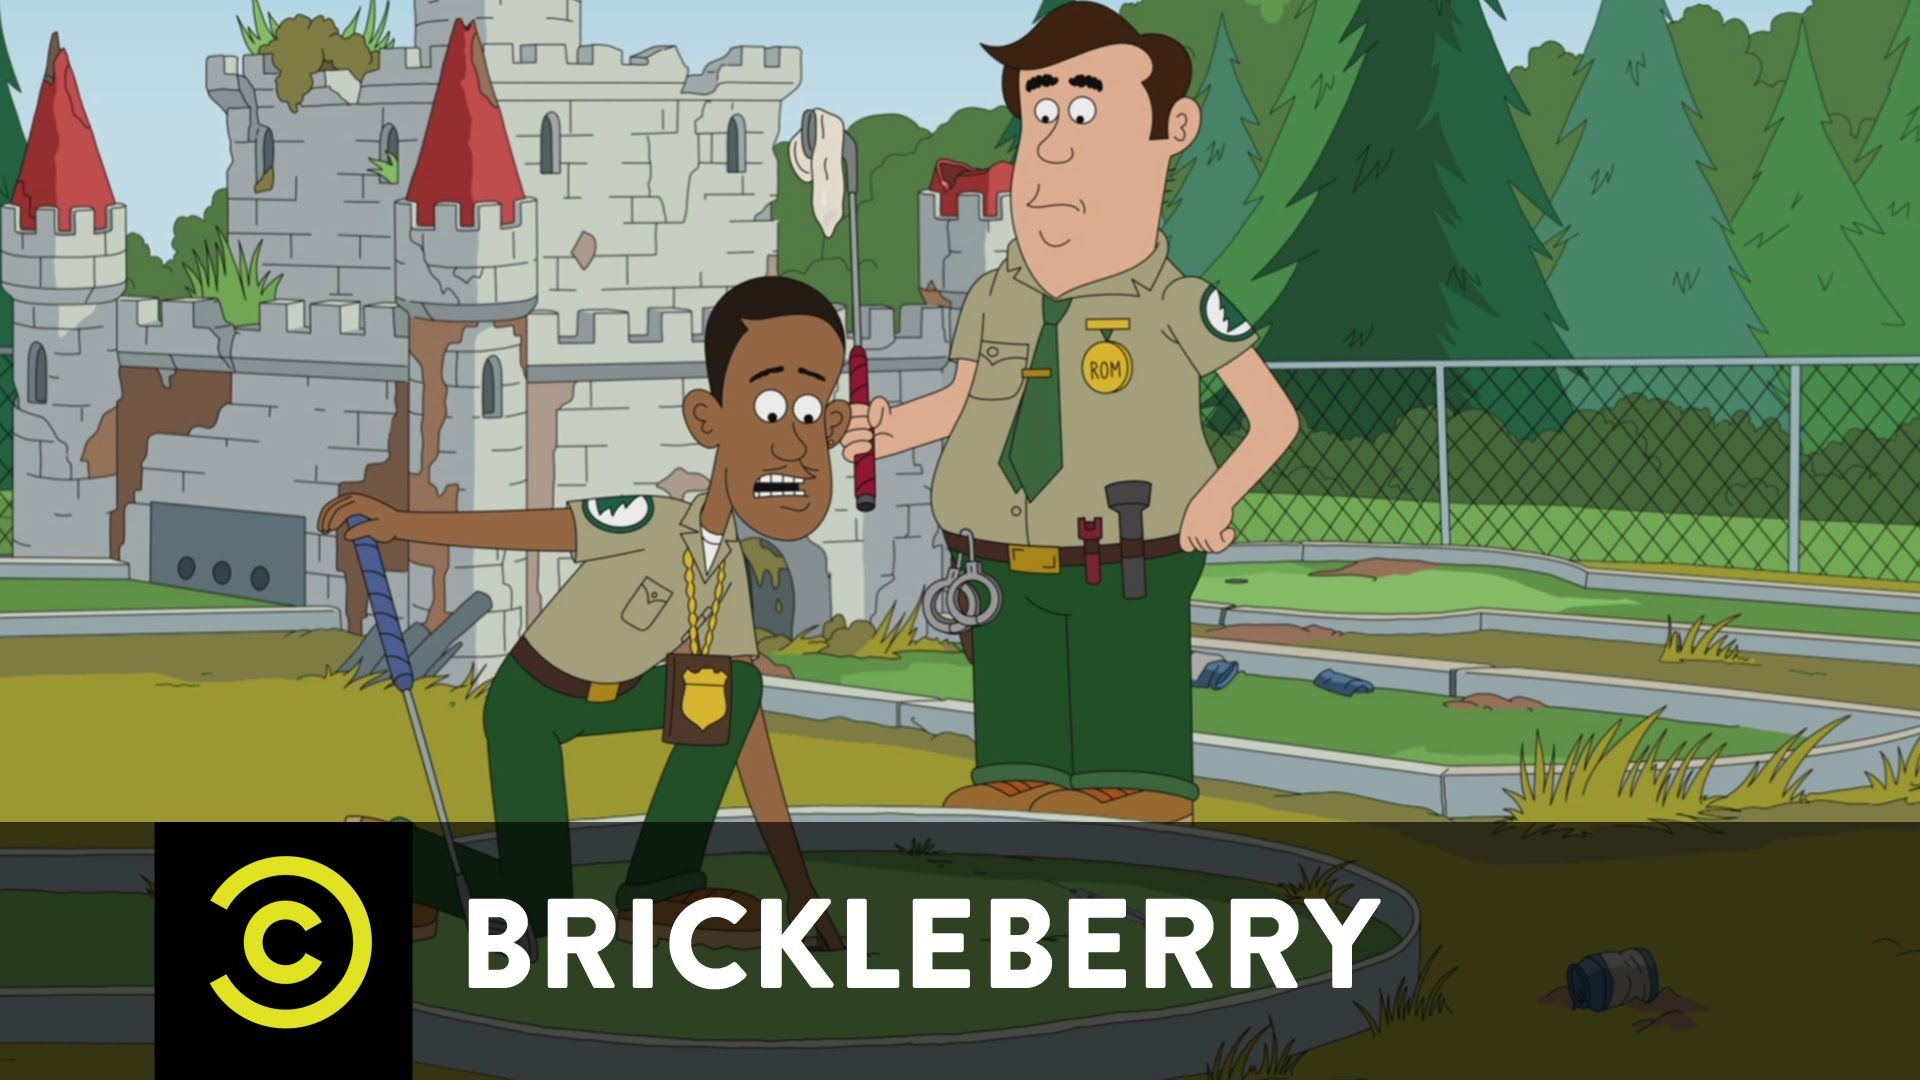 Brickleberry - A New Bum Hole